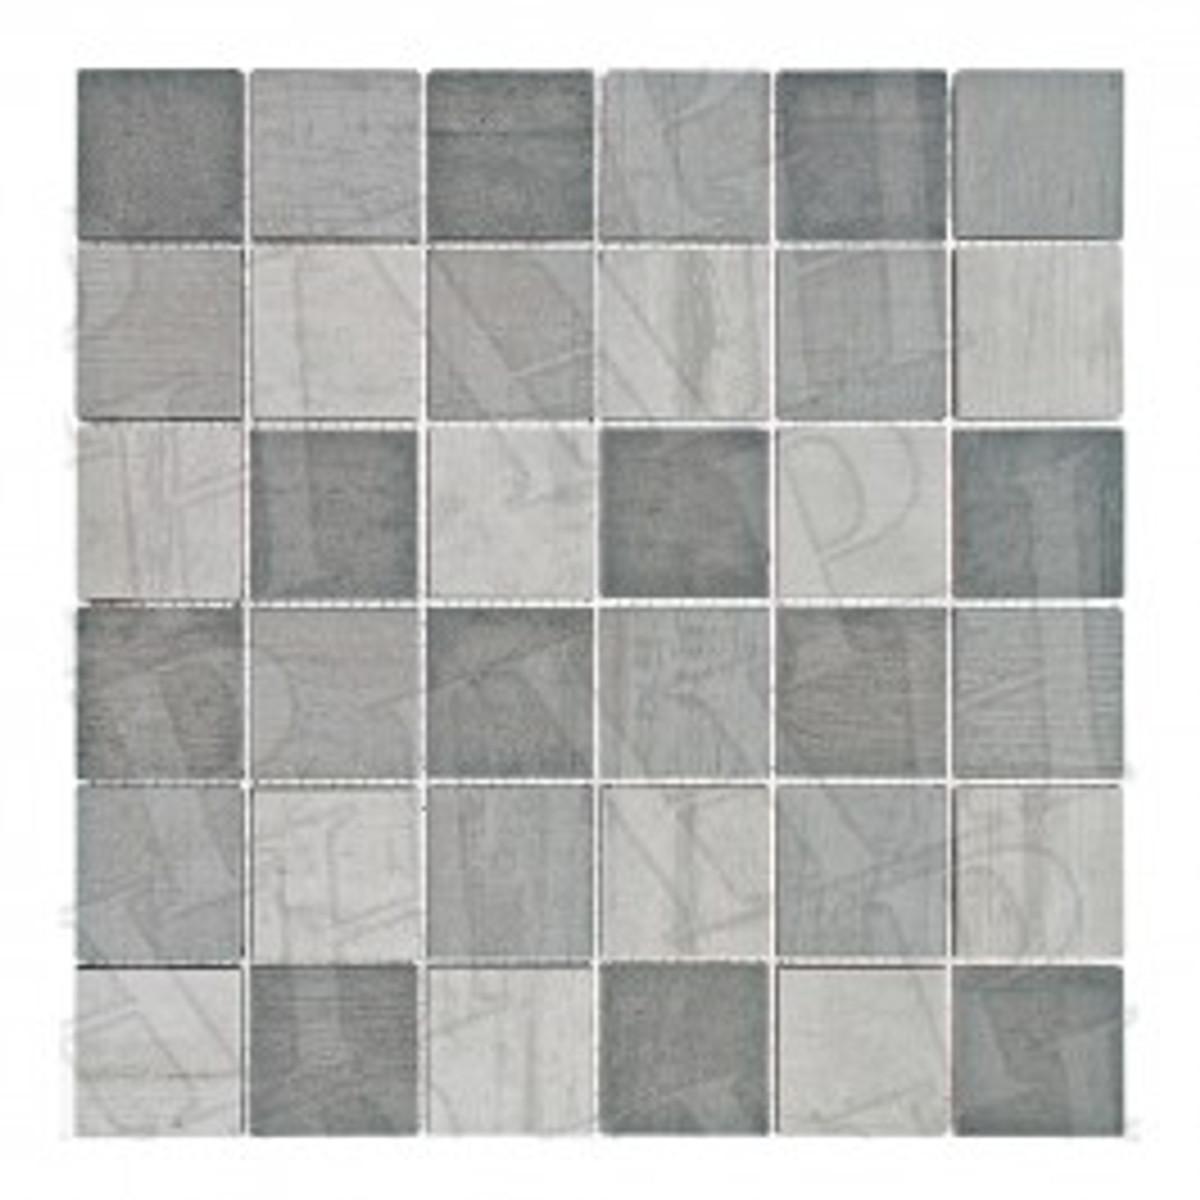 Mosaik Placke Formwork 3  30 x 30 cm